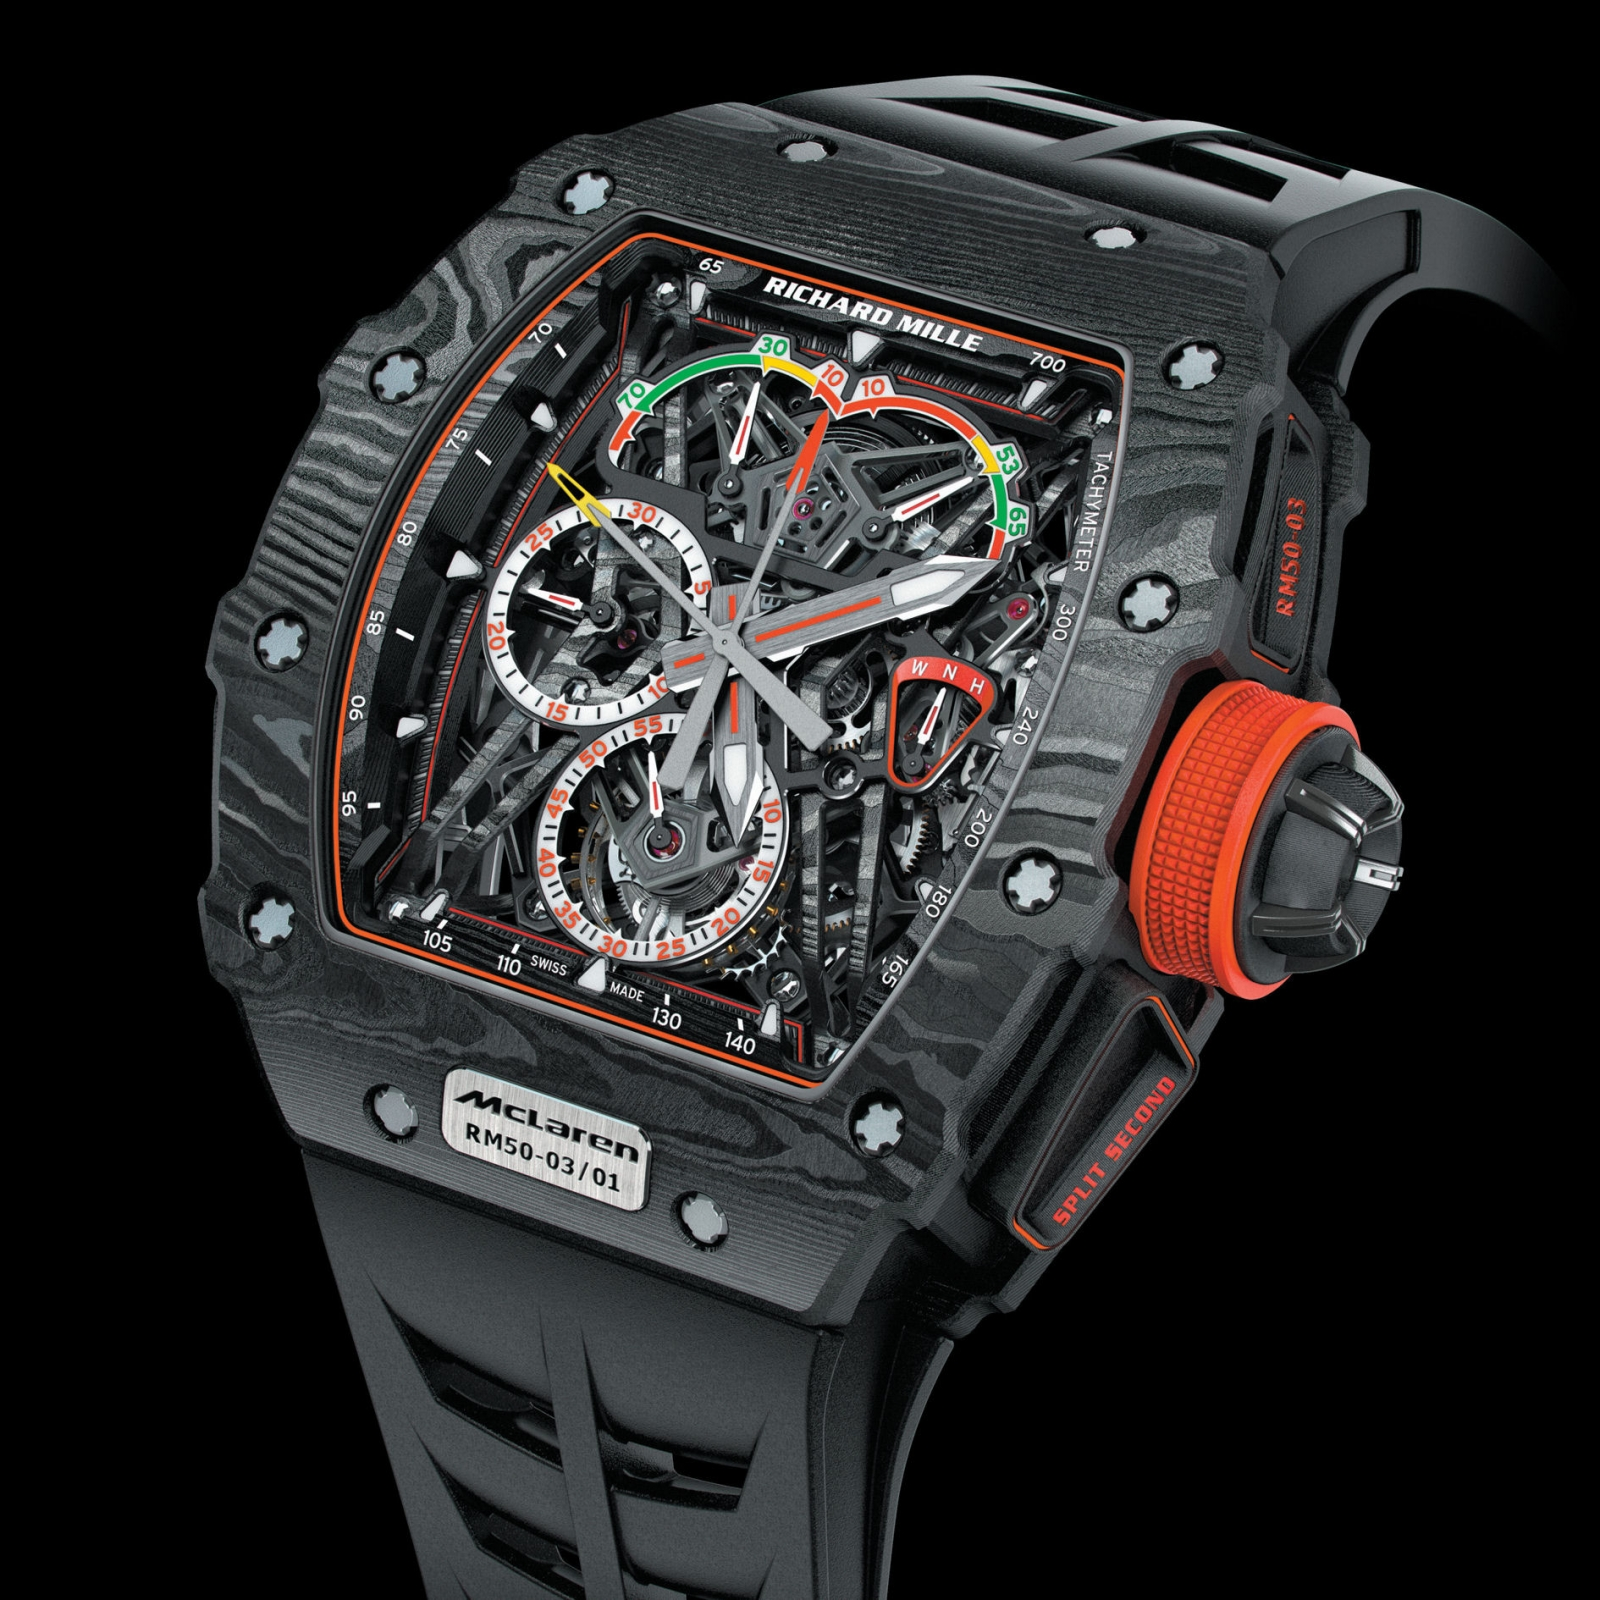 Ultralight mechanical watch made with graphene